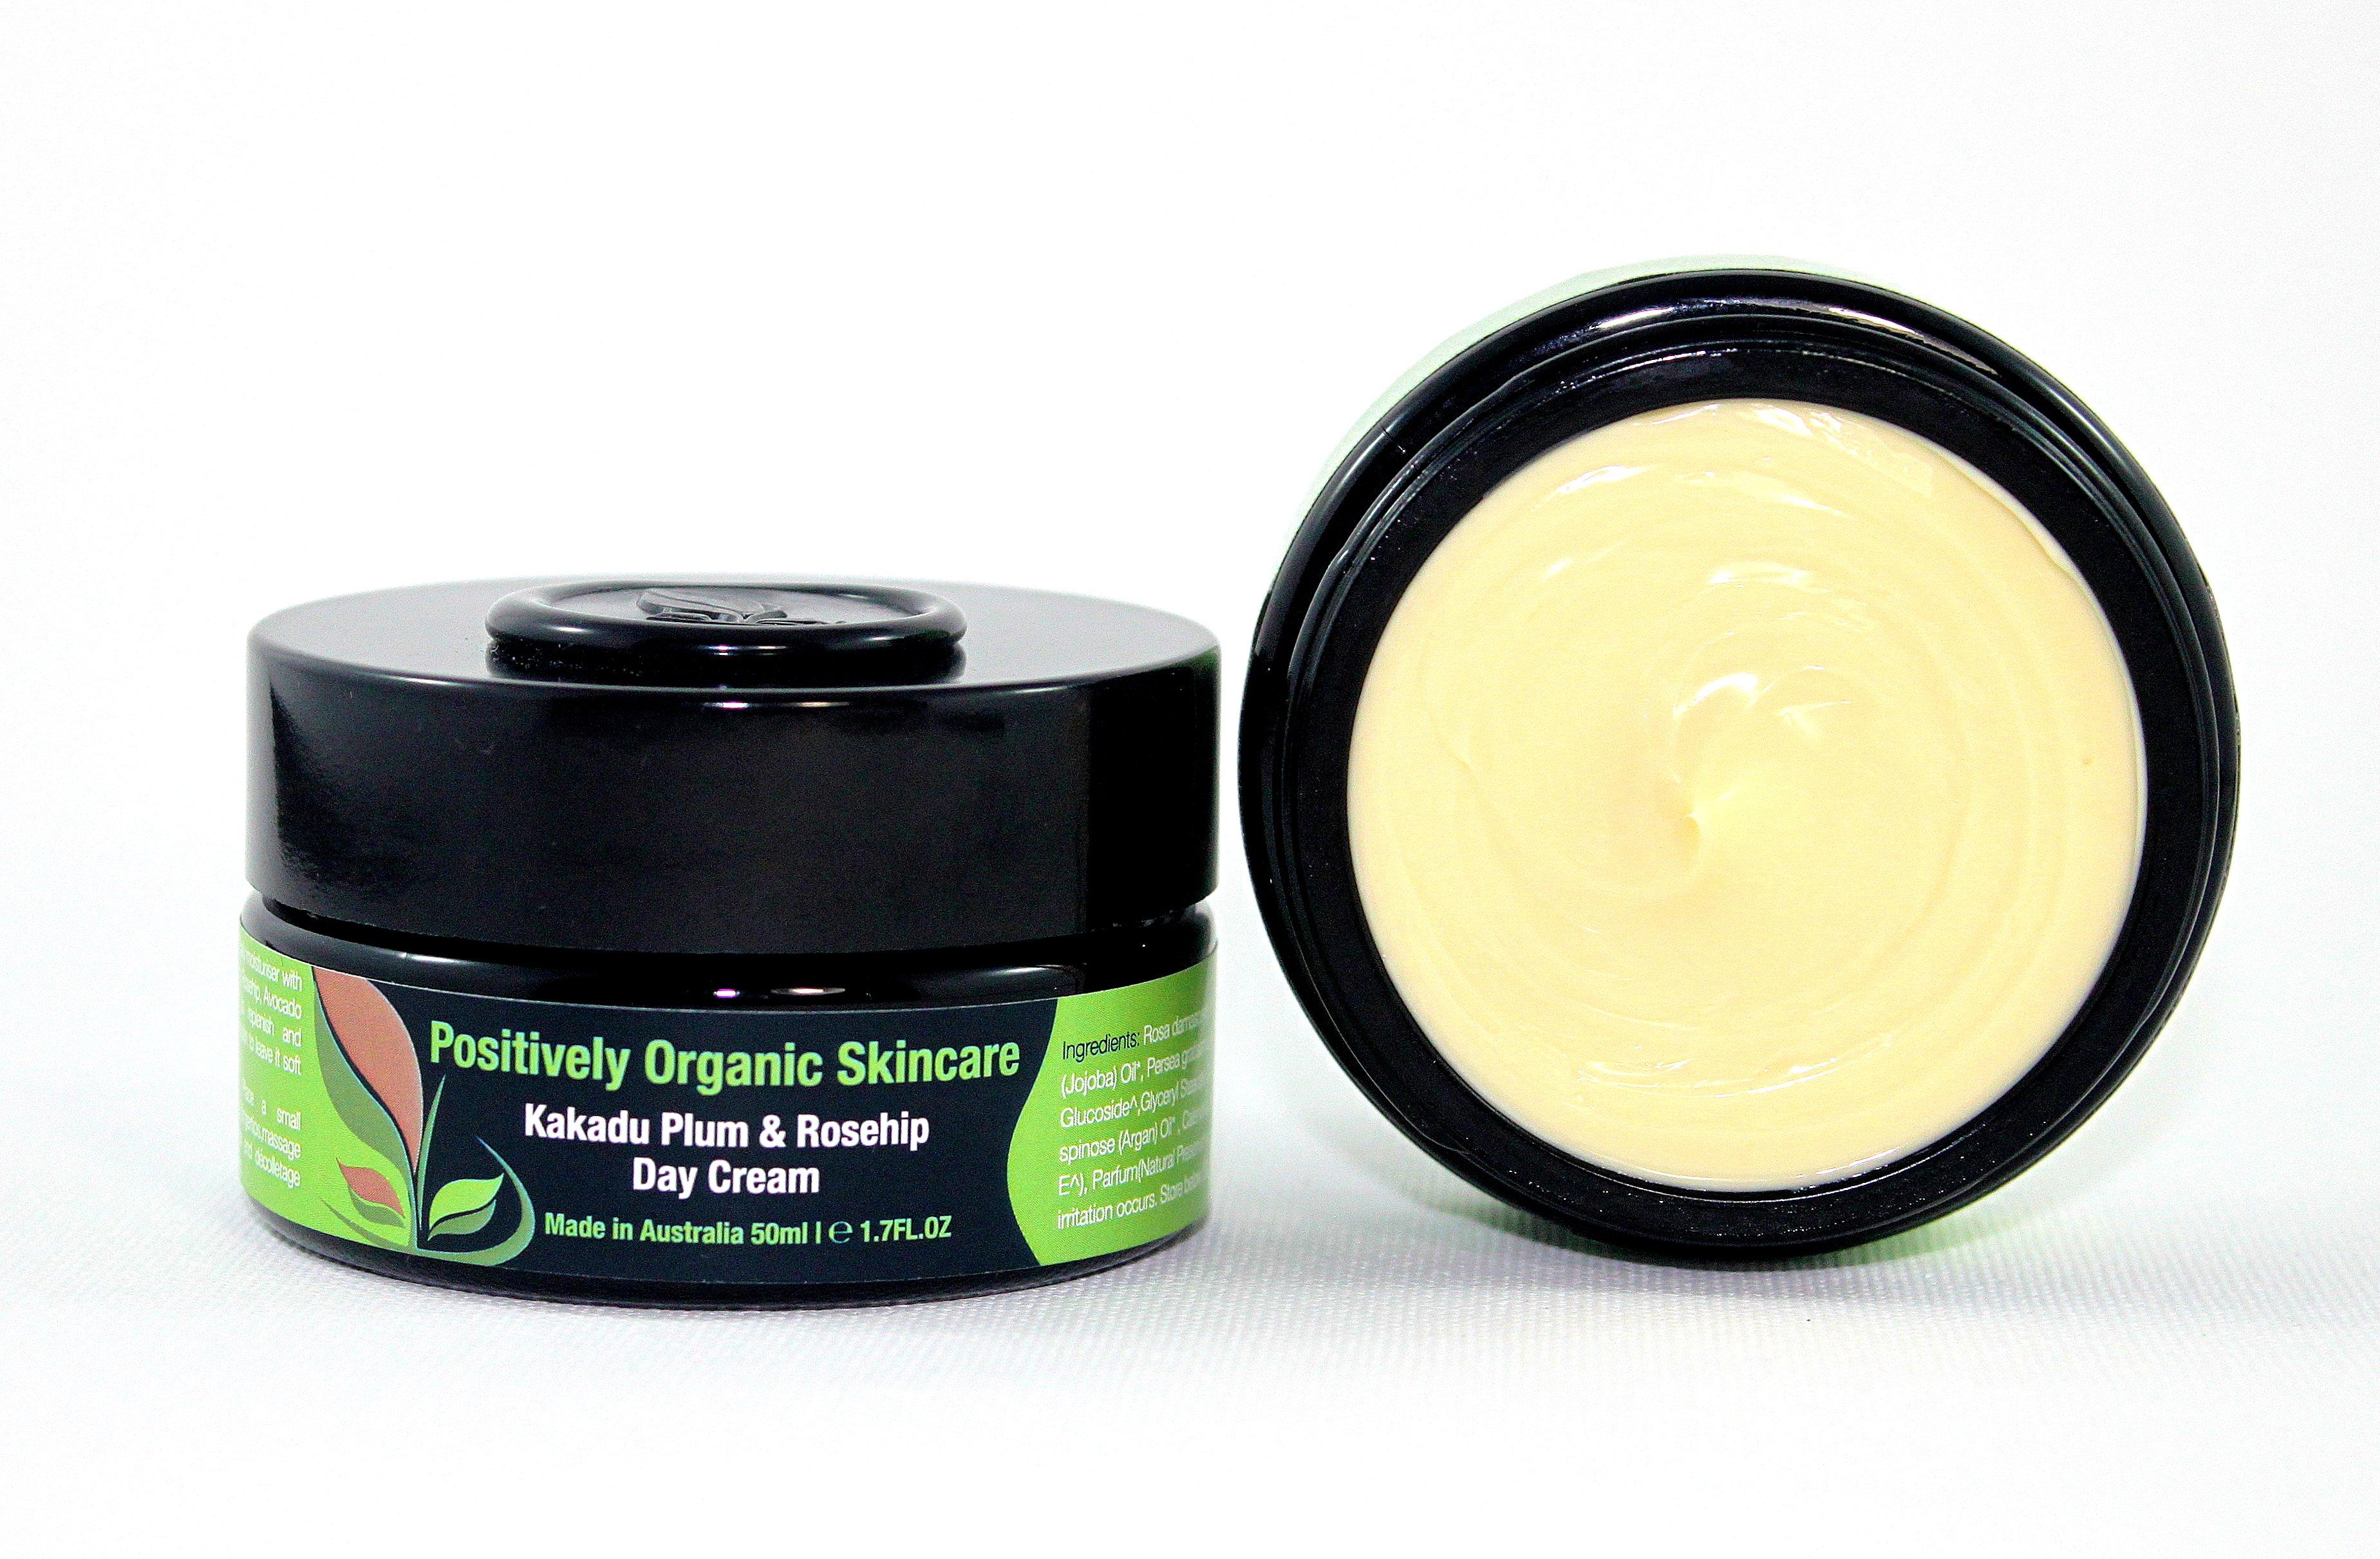 Calendula & Kakadu Plum Day Cream